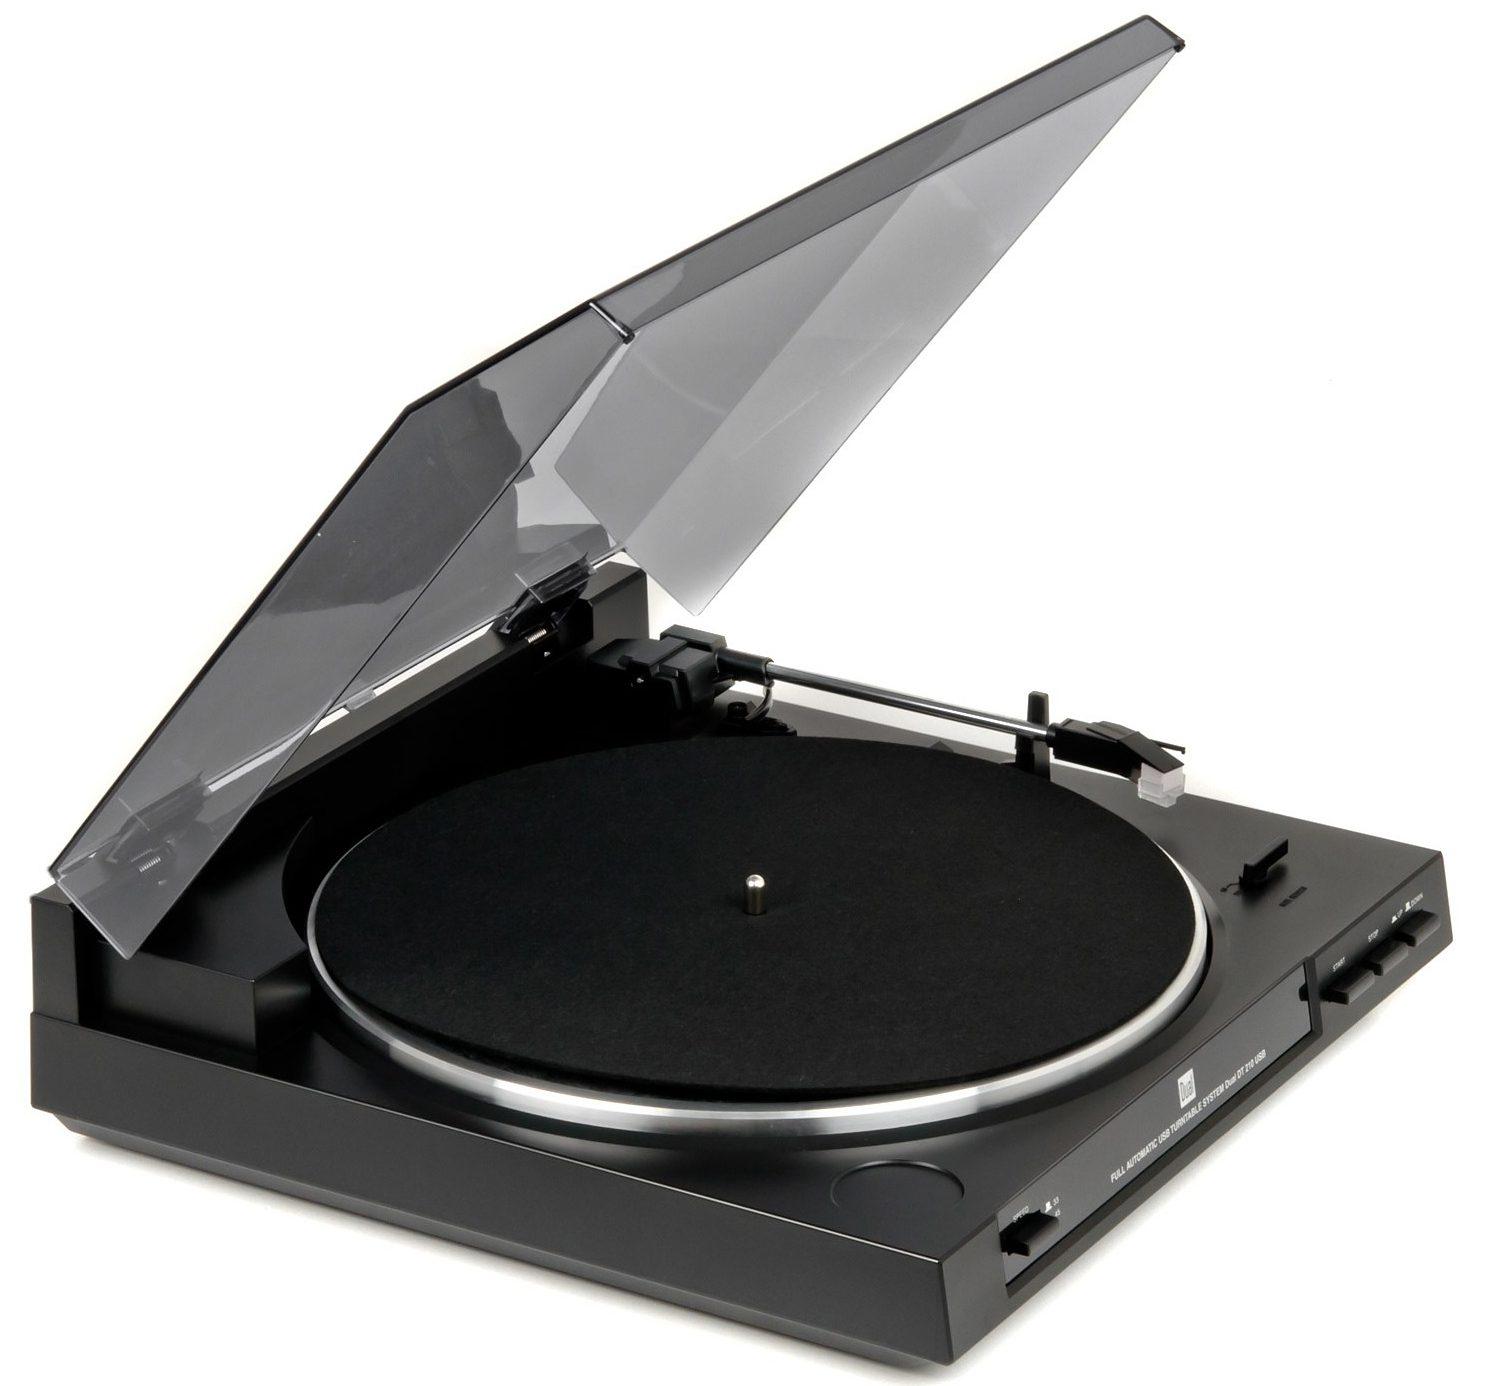 Dual DT 210 USB-Plattenspieler, Schallplattendigitalisierer